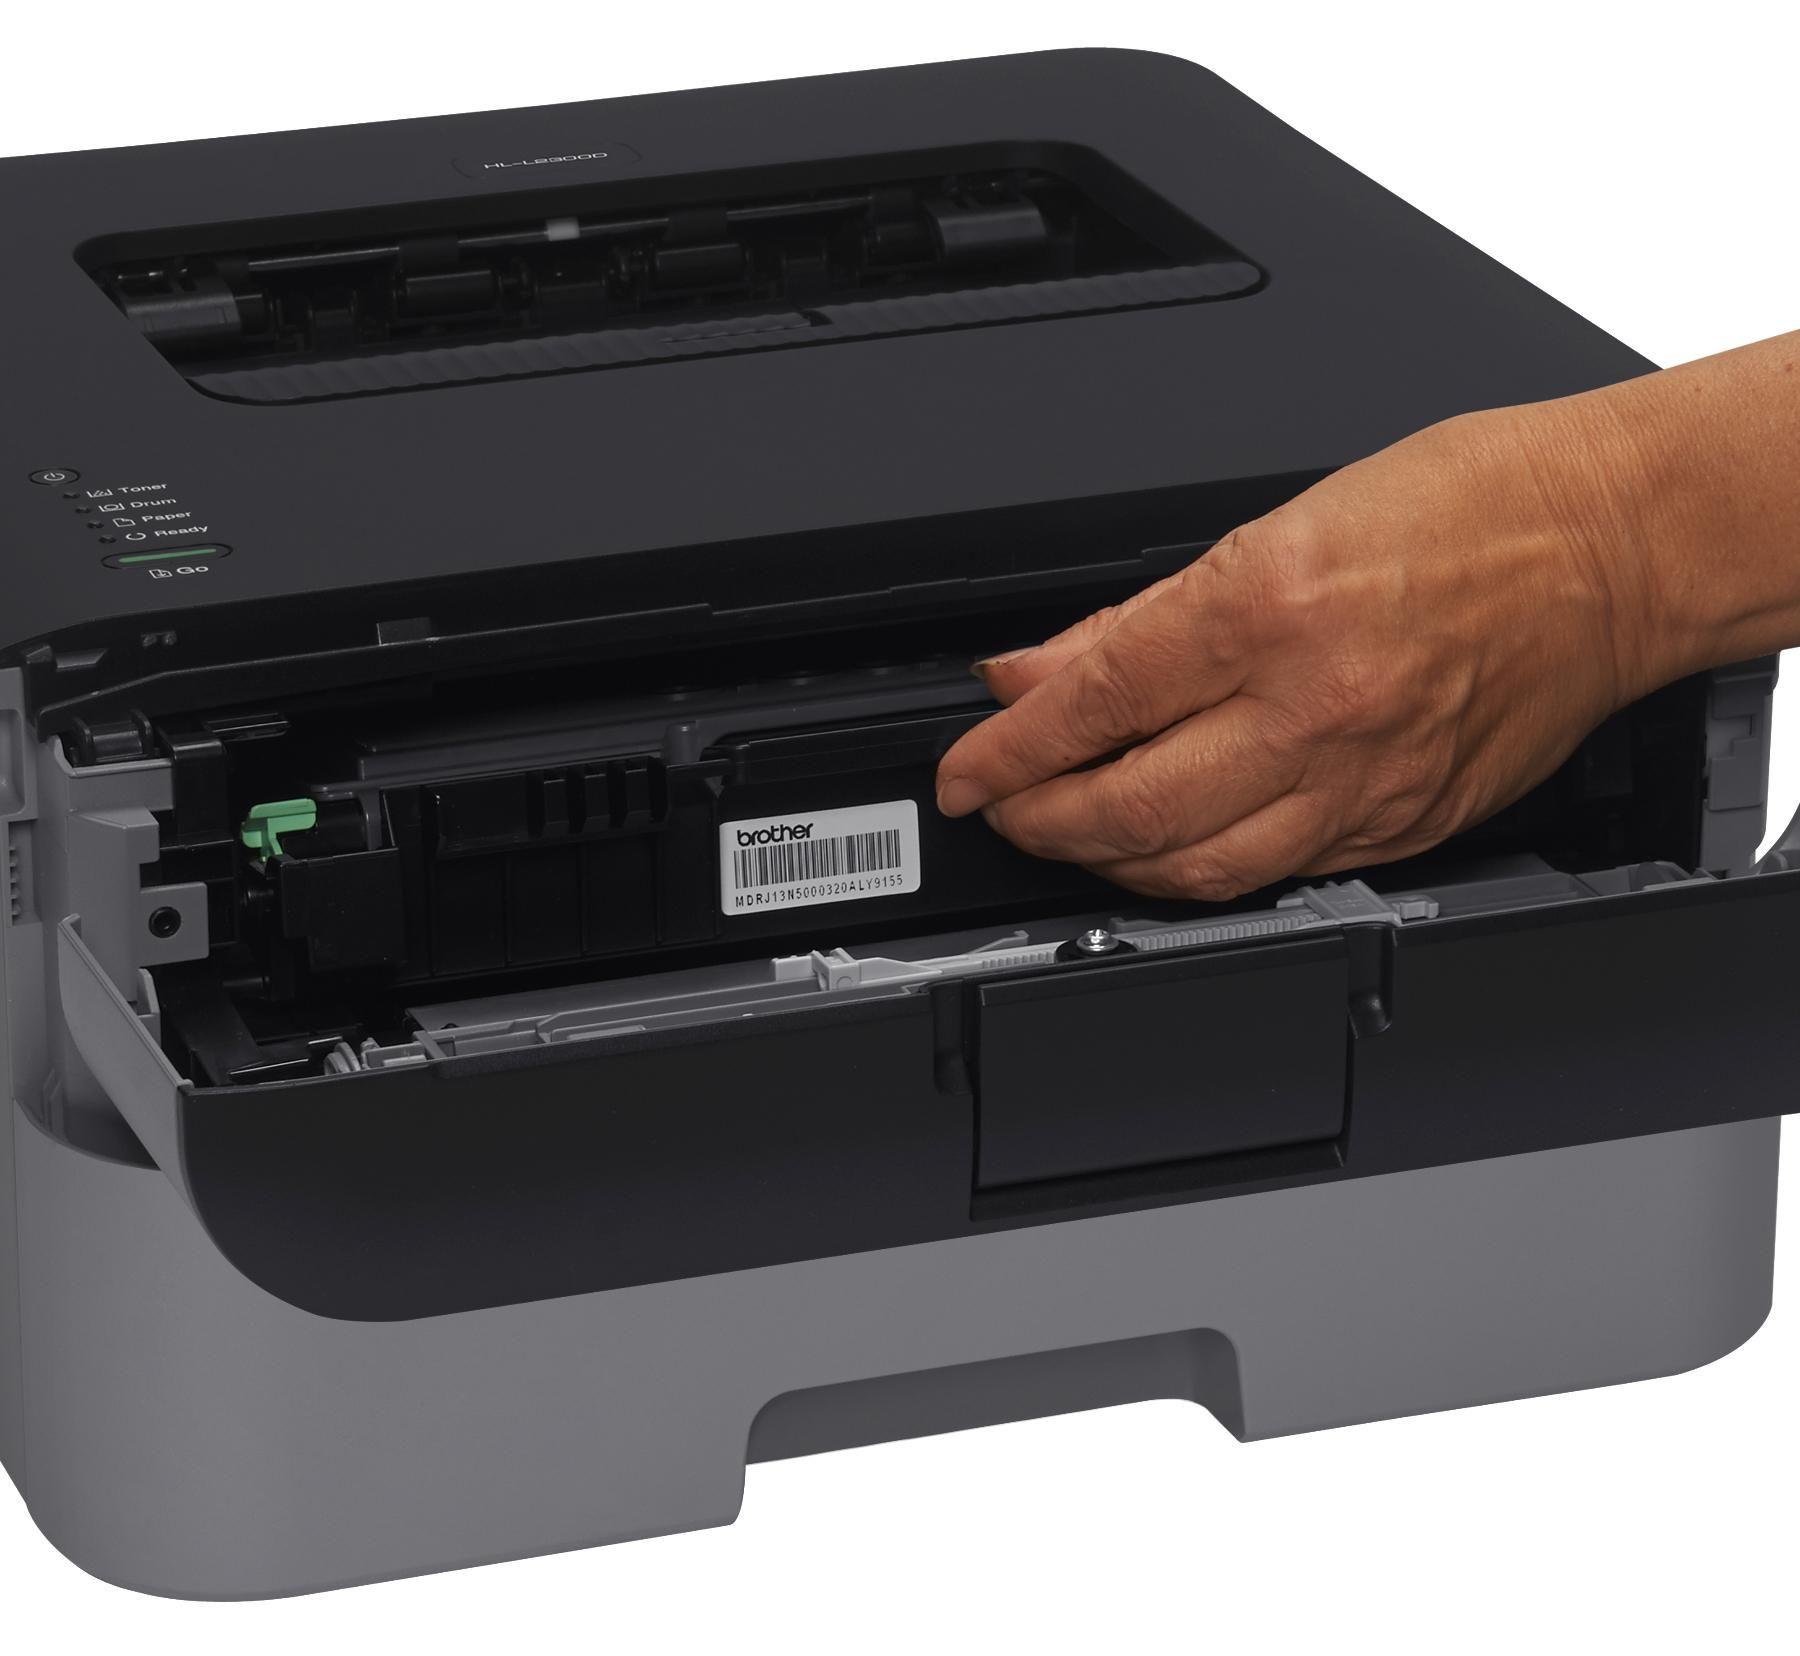 Amazon Com Brother Hl L2300d Monochrome Laser Printer With Duplex Printing Electronics Laser Printer Printer Monochrome